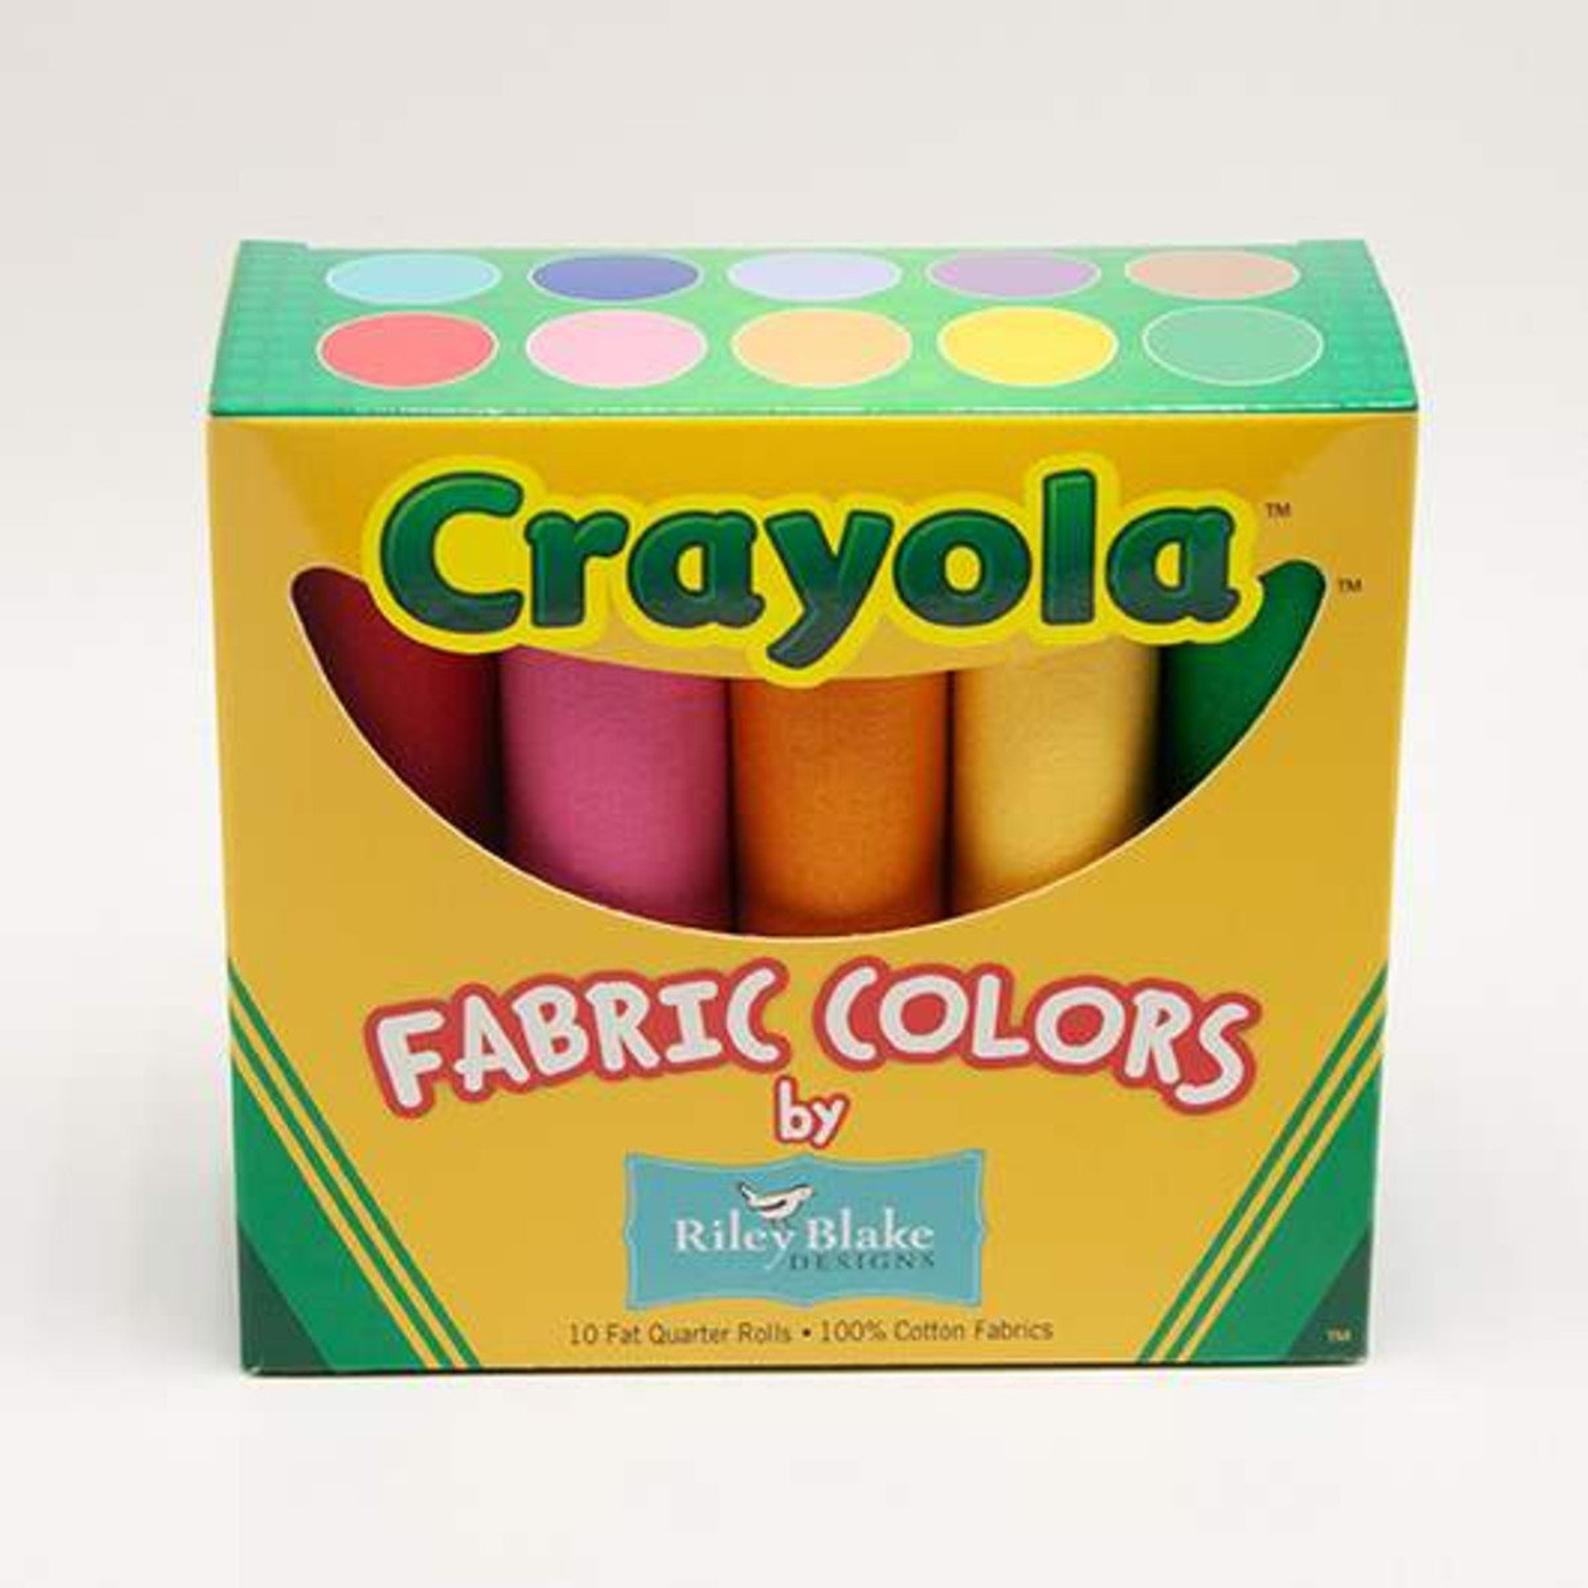 Crayola Fabric Colors-10 fat qtrs-Riley Blake *